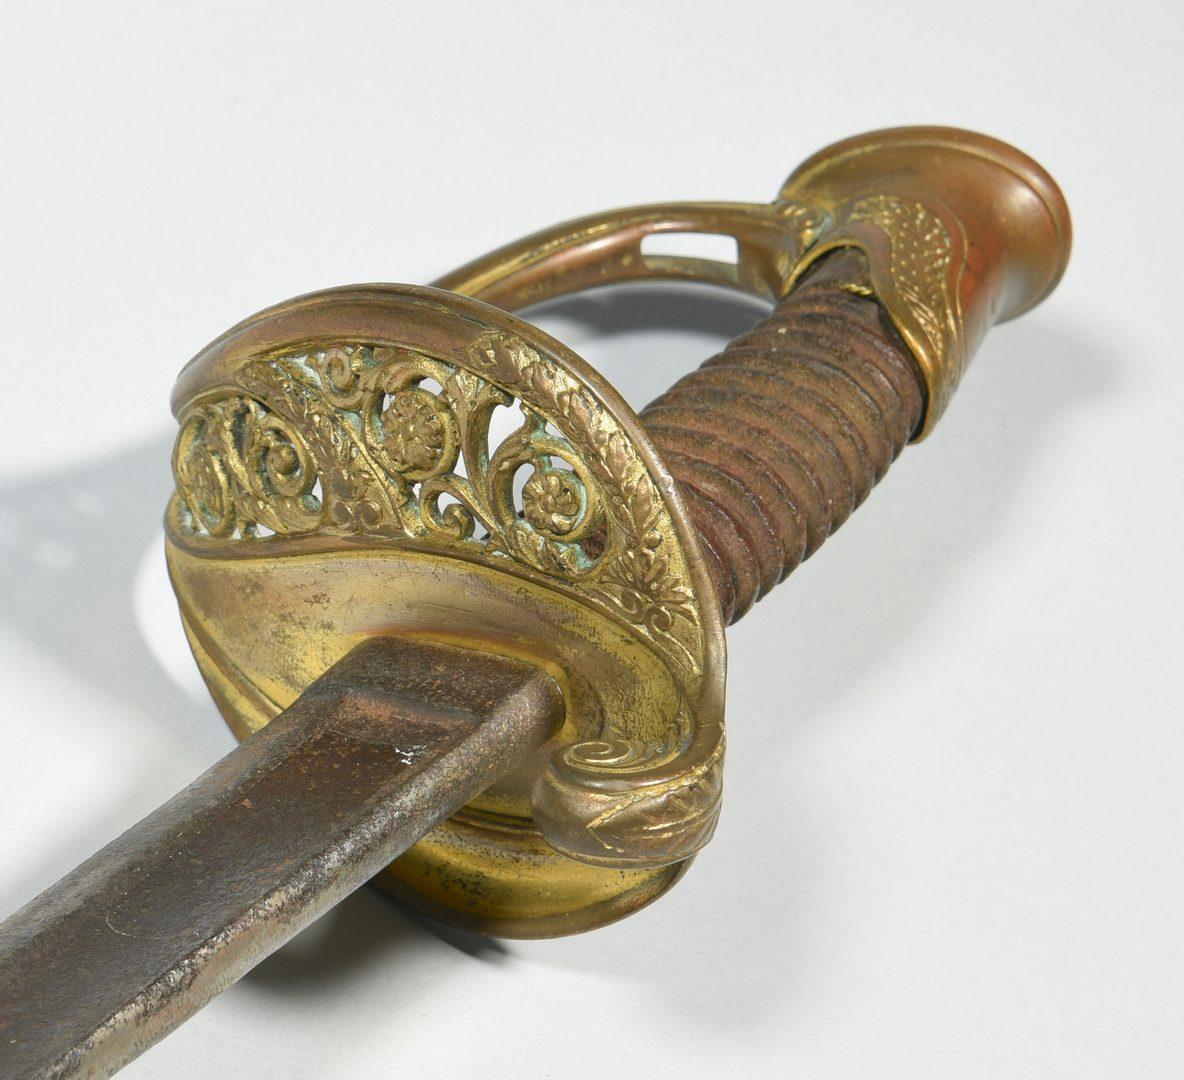 Lot 295: 2 Civil War Era Officer's Swords, Devon Farm